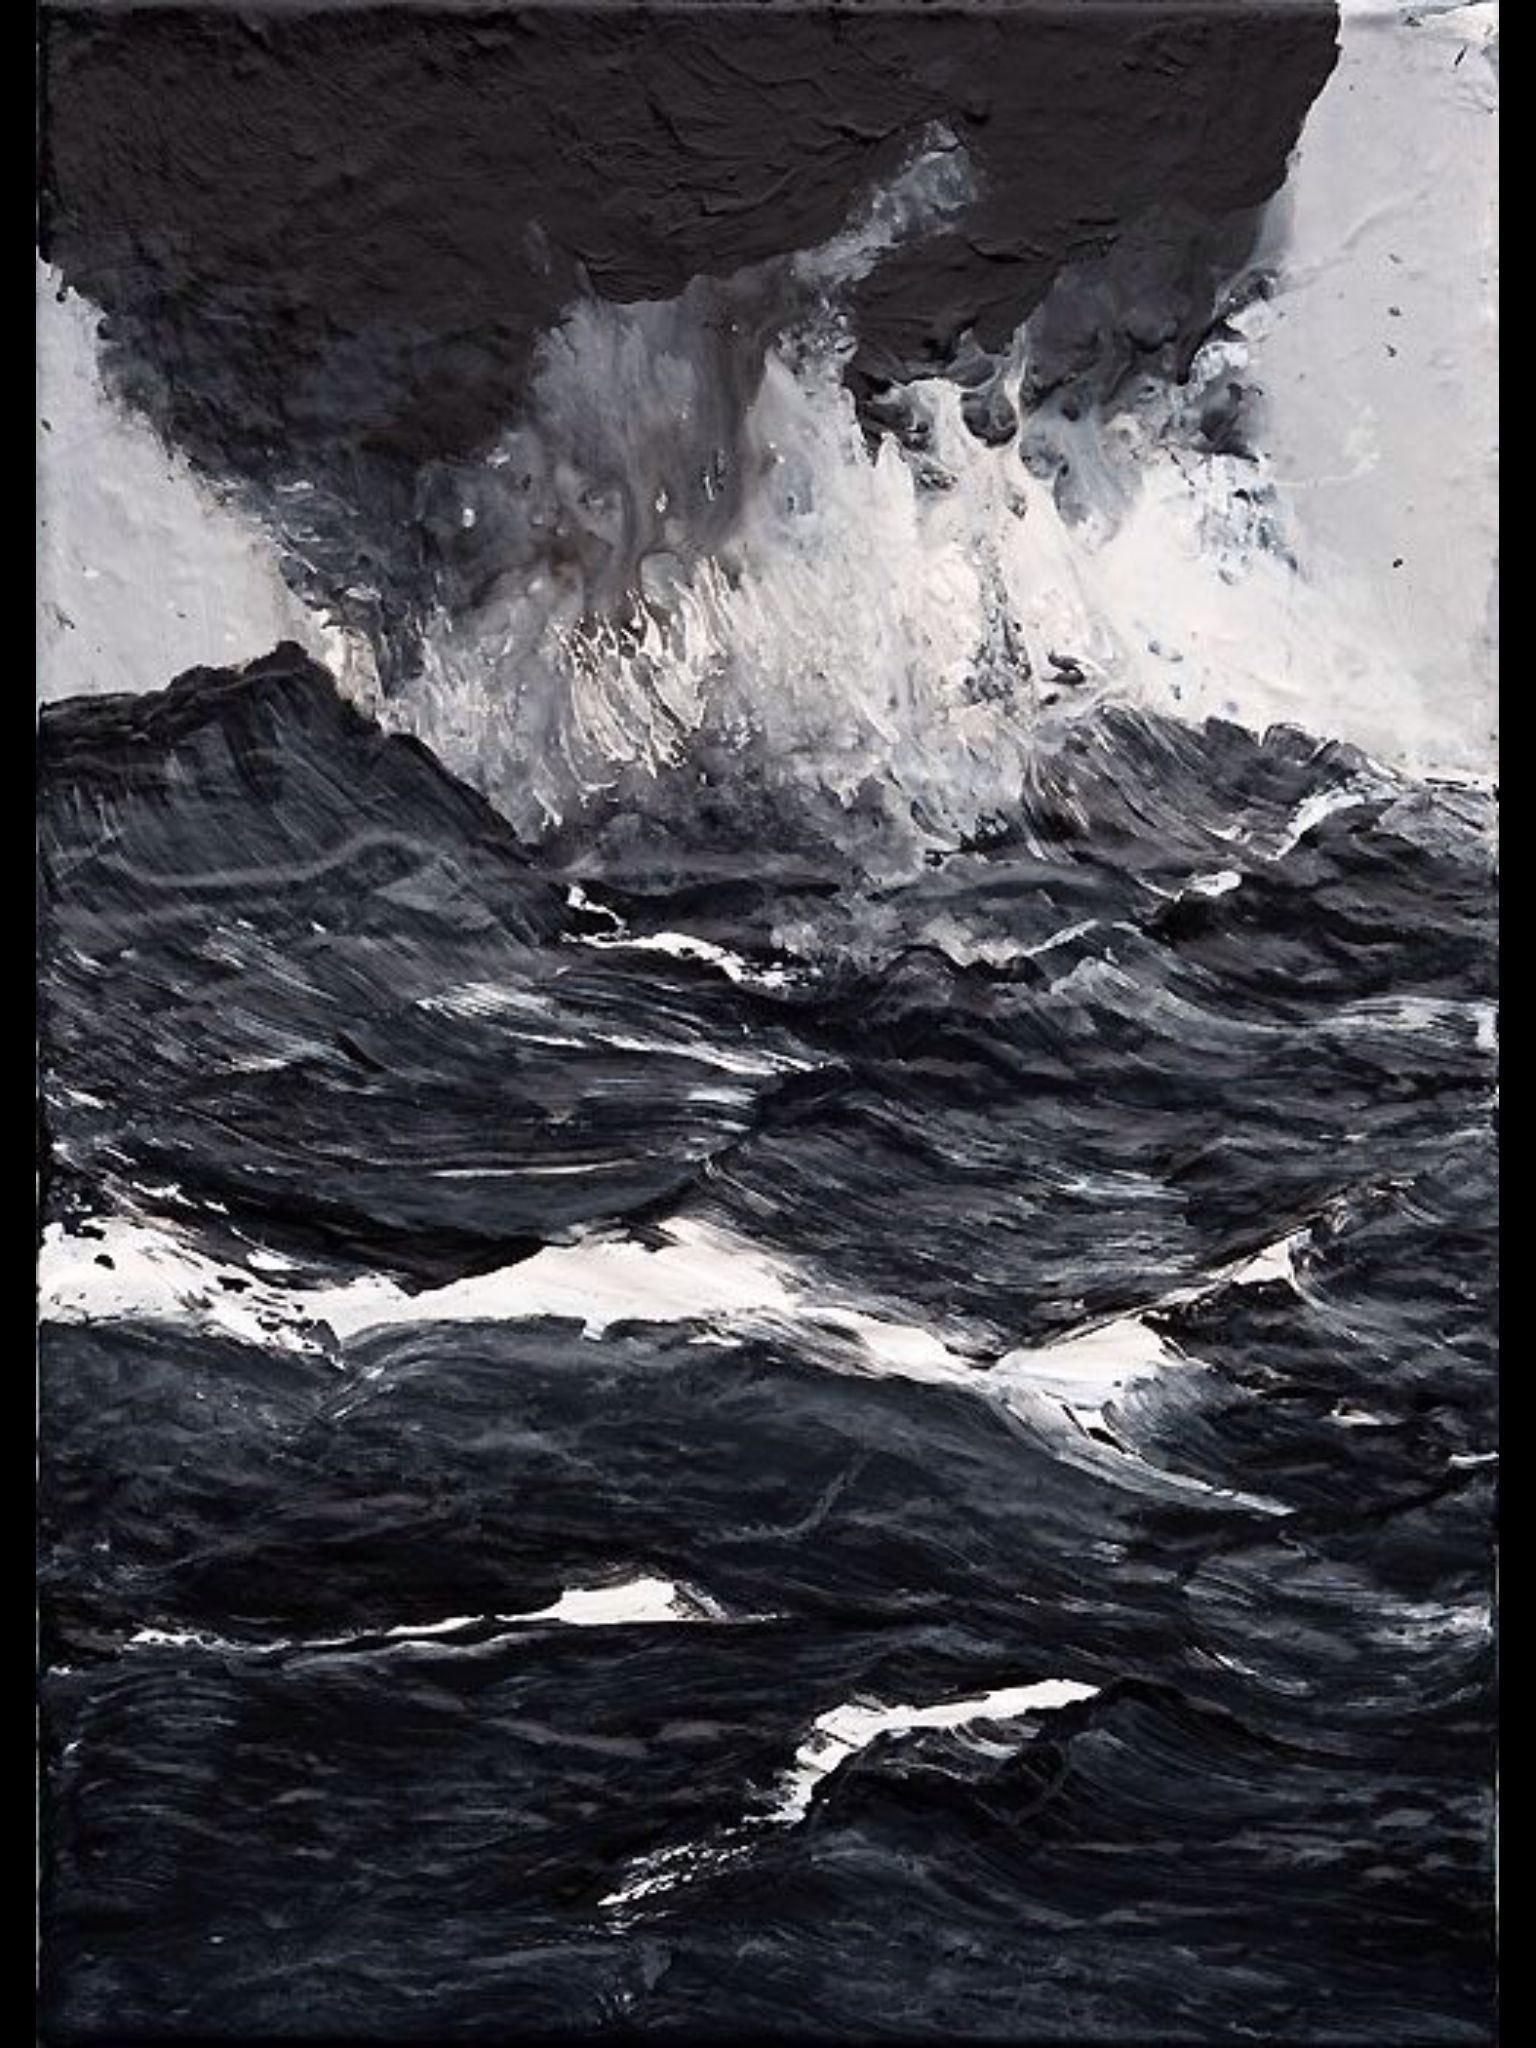 Pin by Seth Renshaw on Ocean | Painting, Illustration art, Art